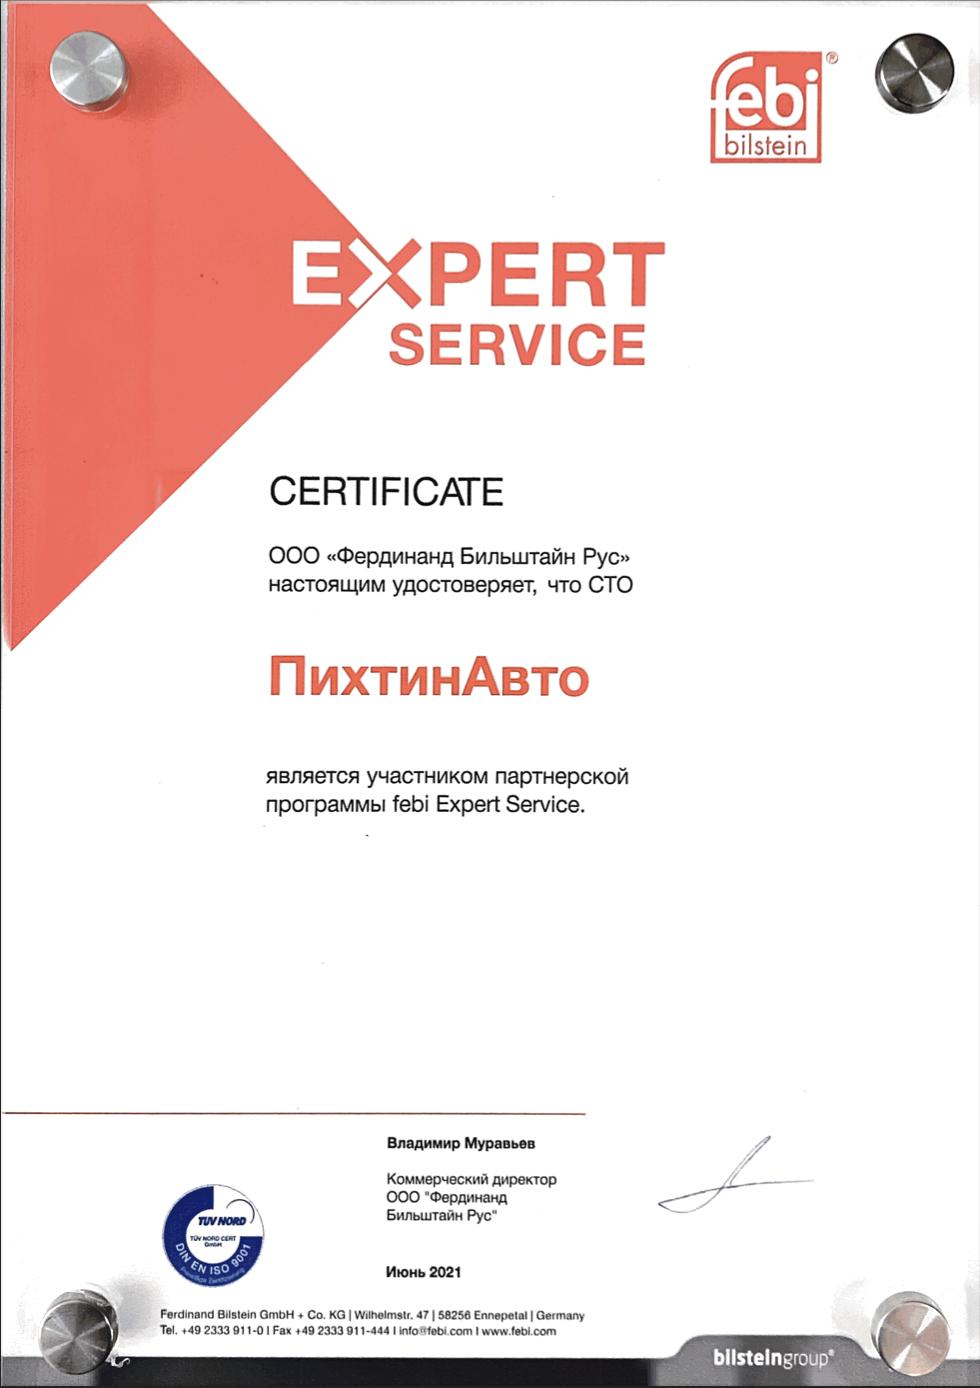 ПихтинАвто - партнер Febi Expert Service! Гарантия на запчасти Febi - 3 года!